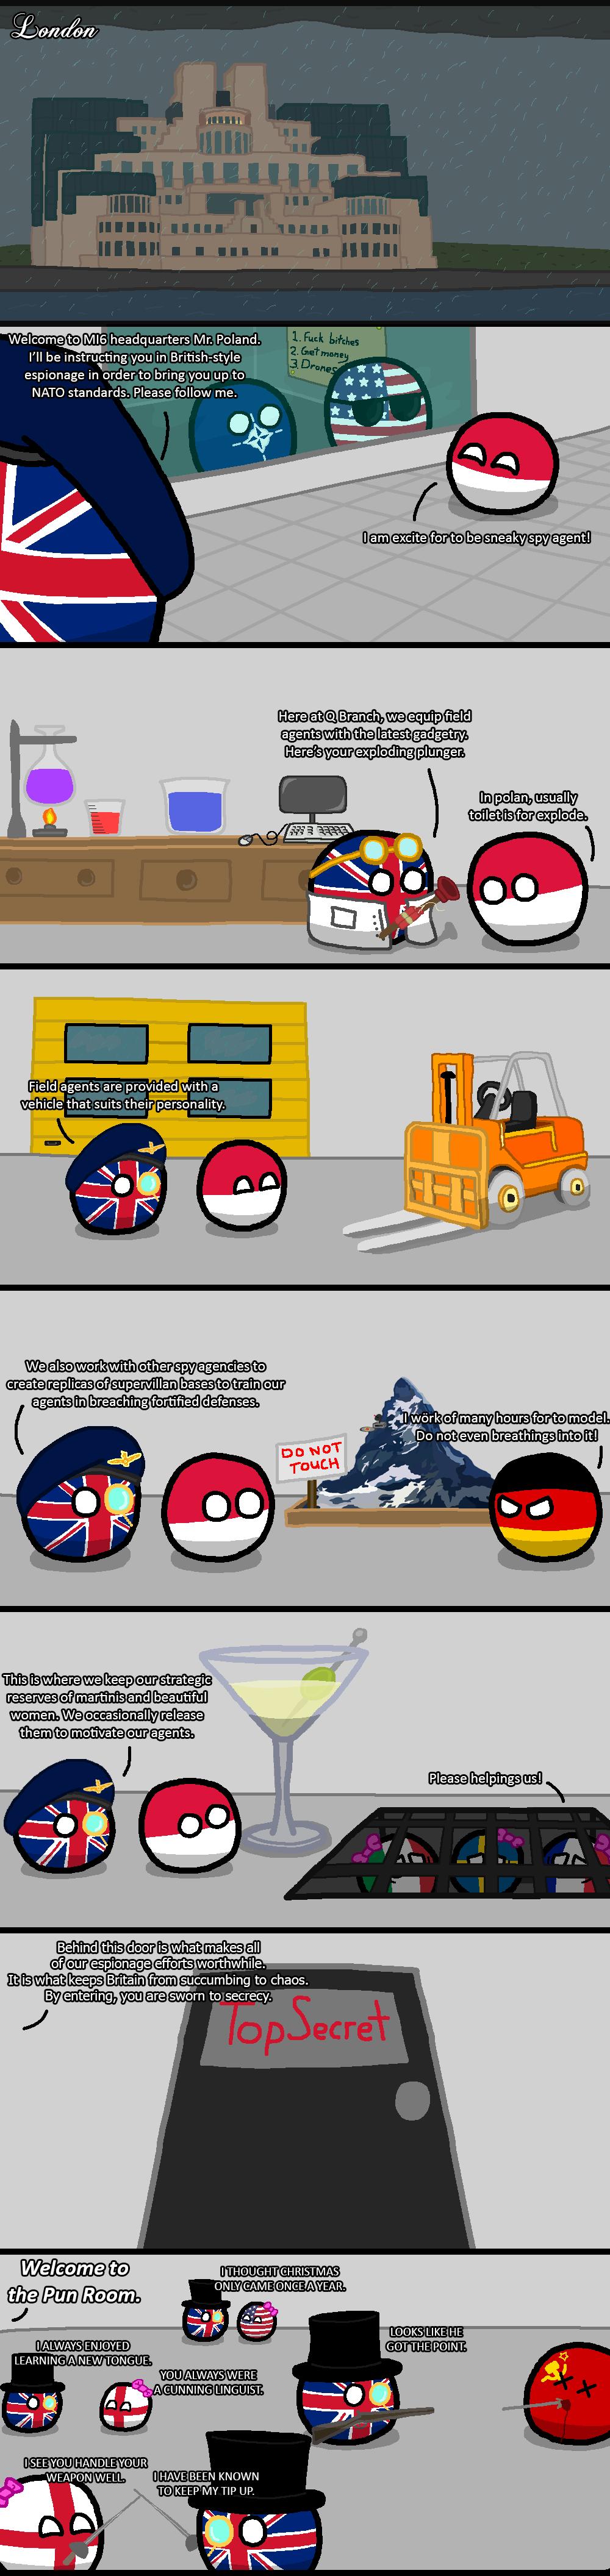 country-balls-a-crash-course-in-british-espionage